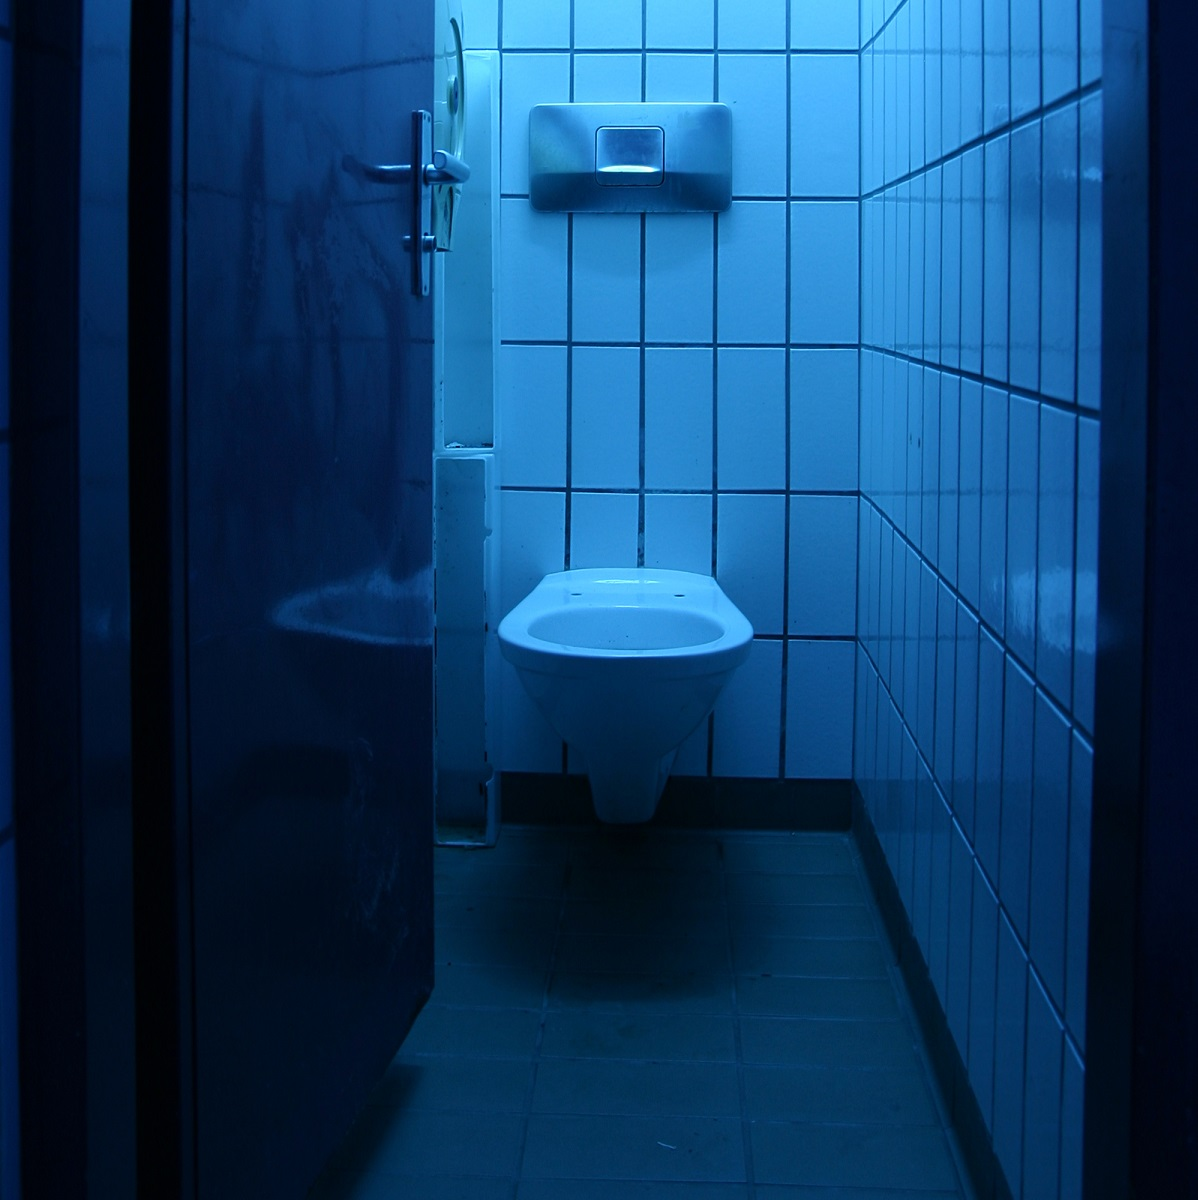 Public Restroom Use